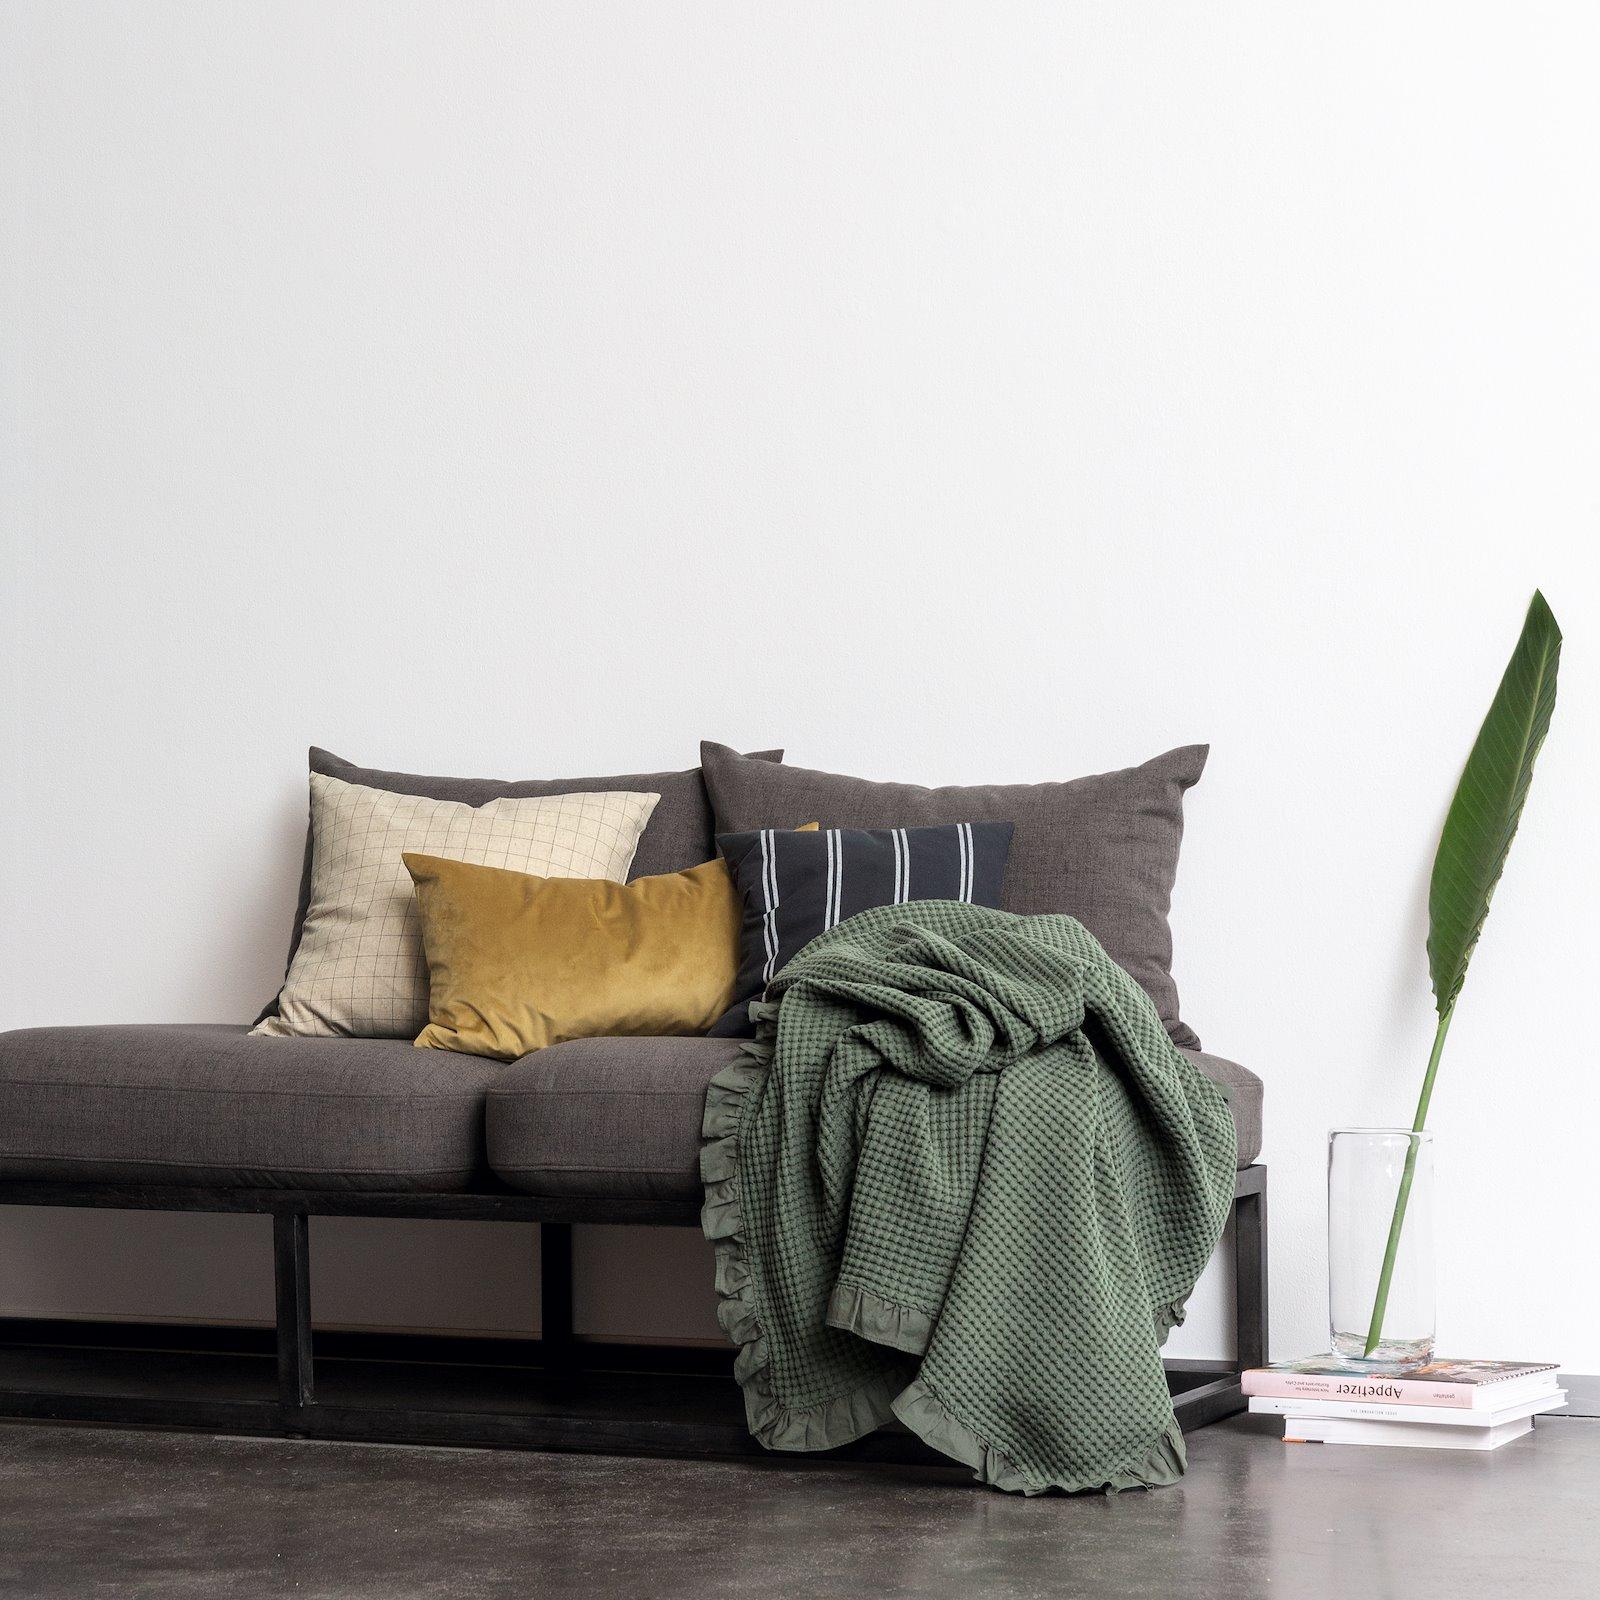 Upholstery fabric w/backing warm walnut 824150_816260_824166_816256_501886_DIY8020_4336_bundle